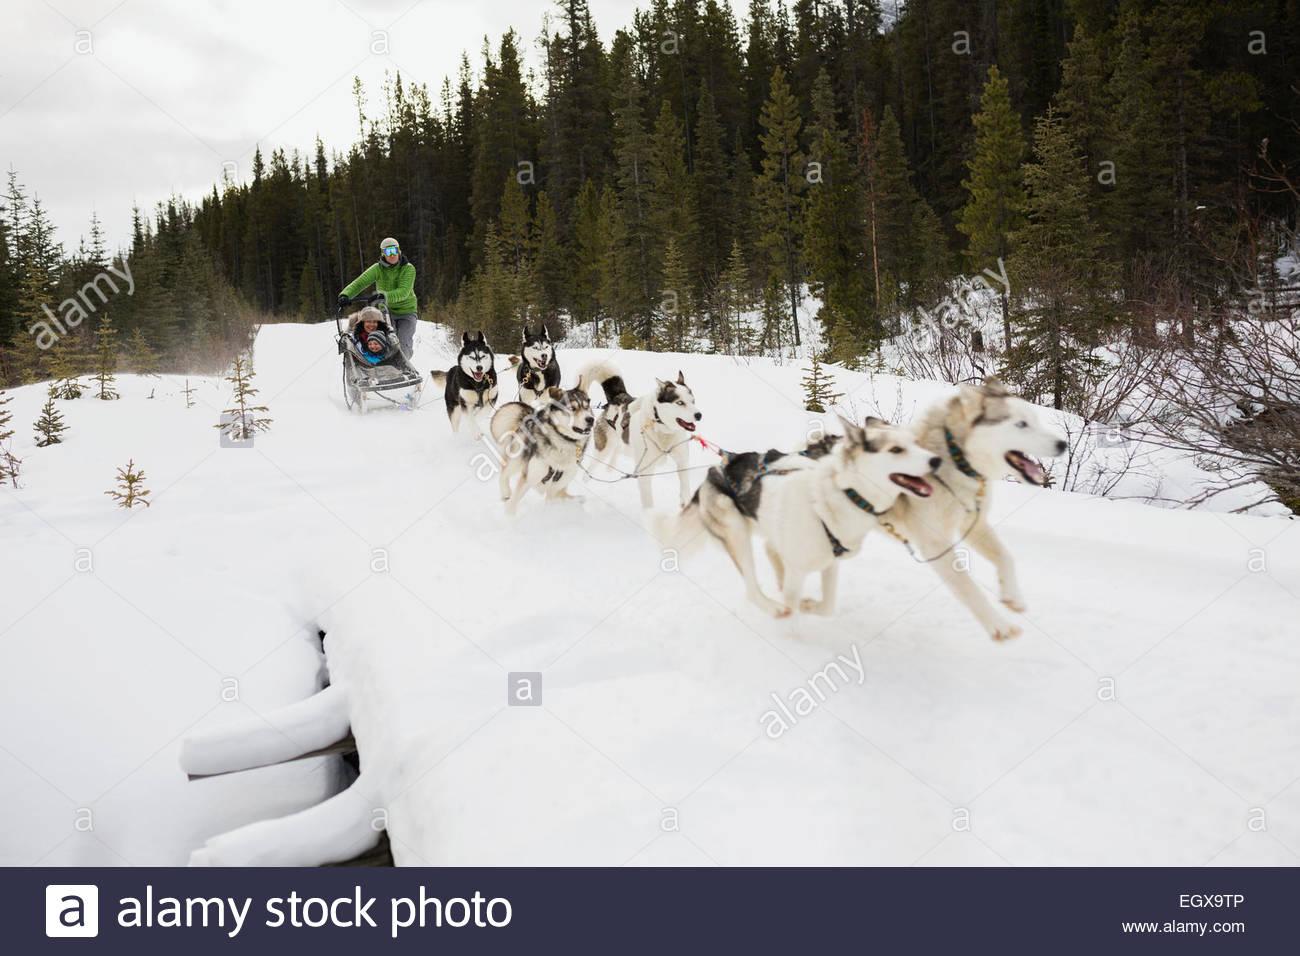 Family dogsledding across snowy bridge Stock Photo